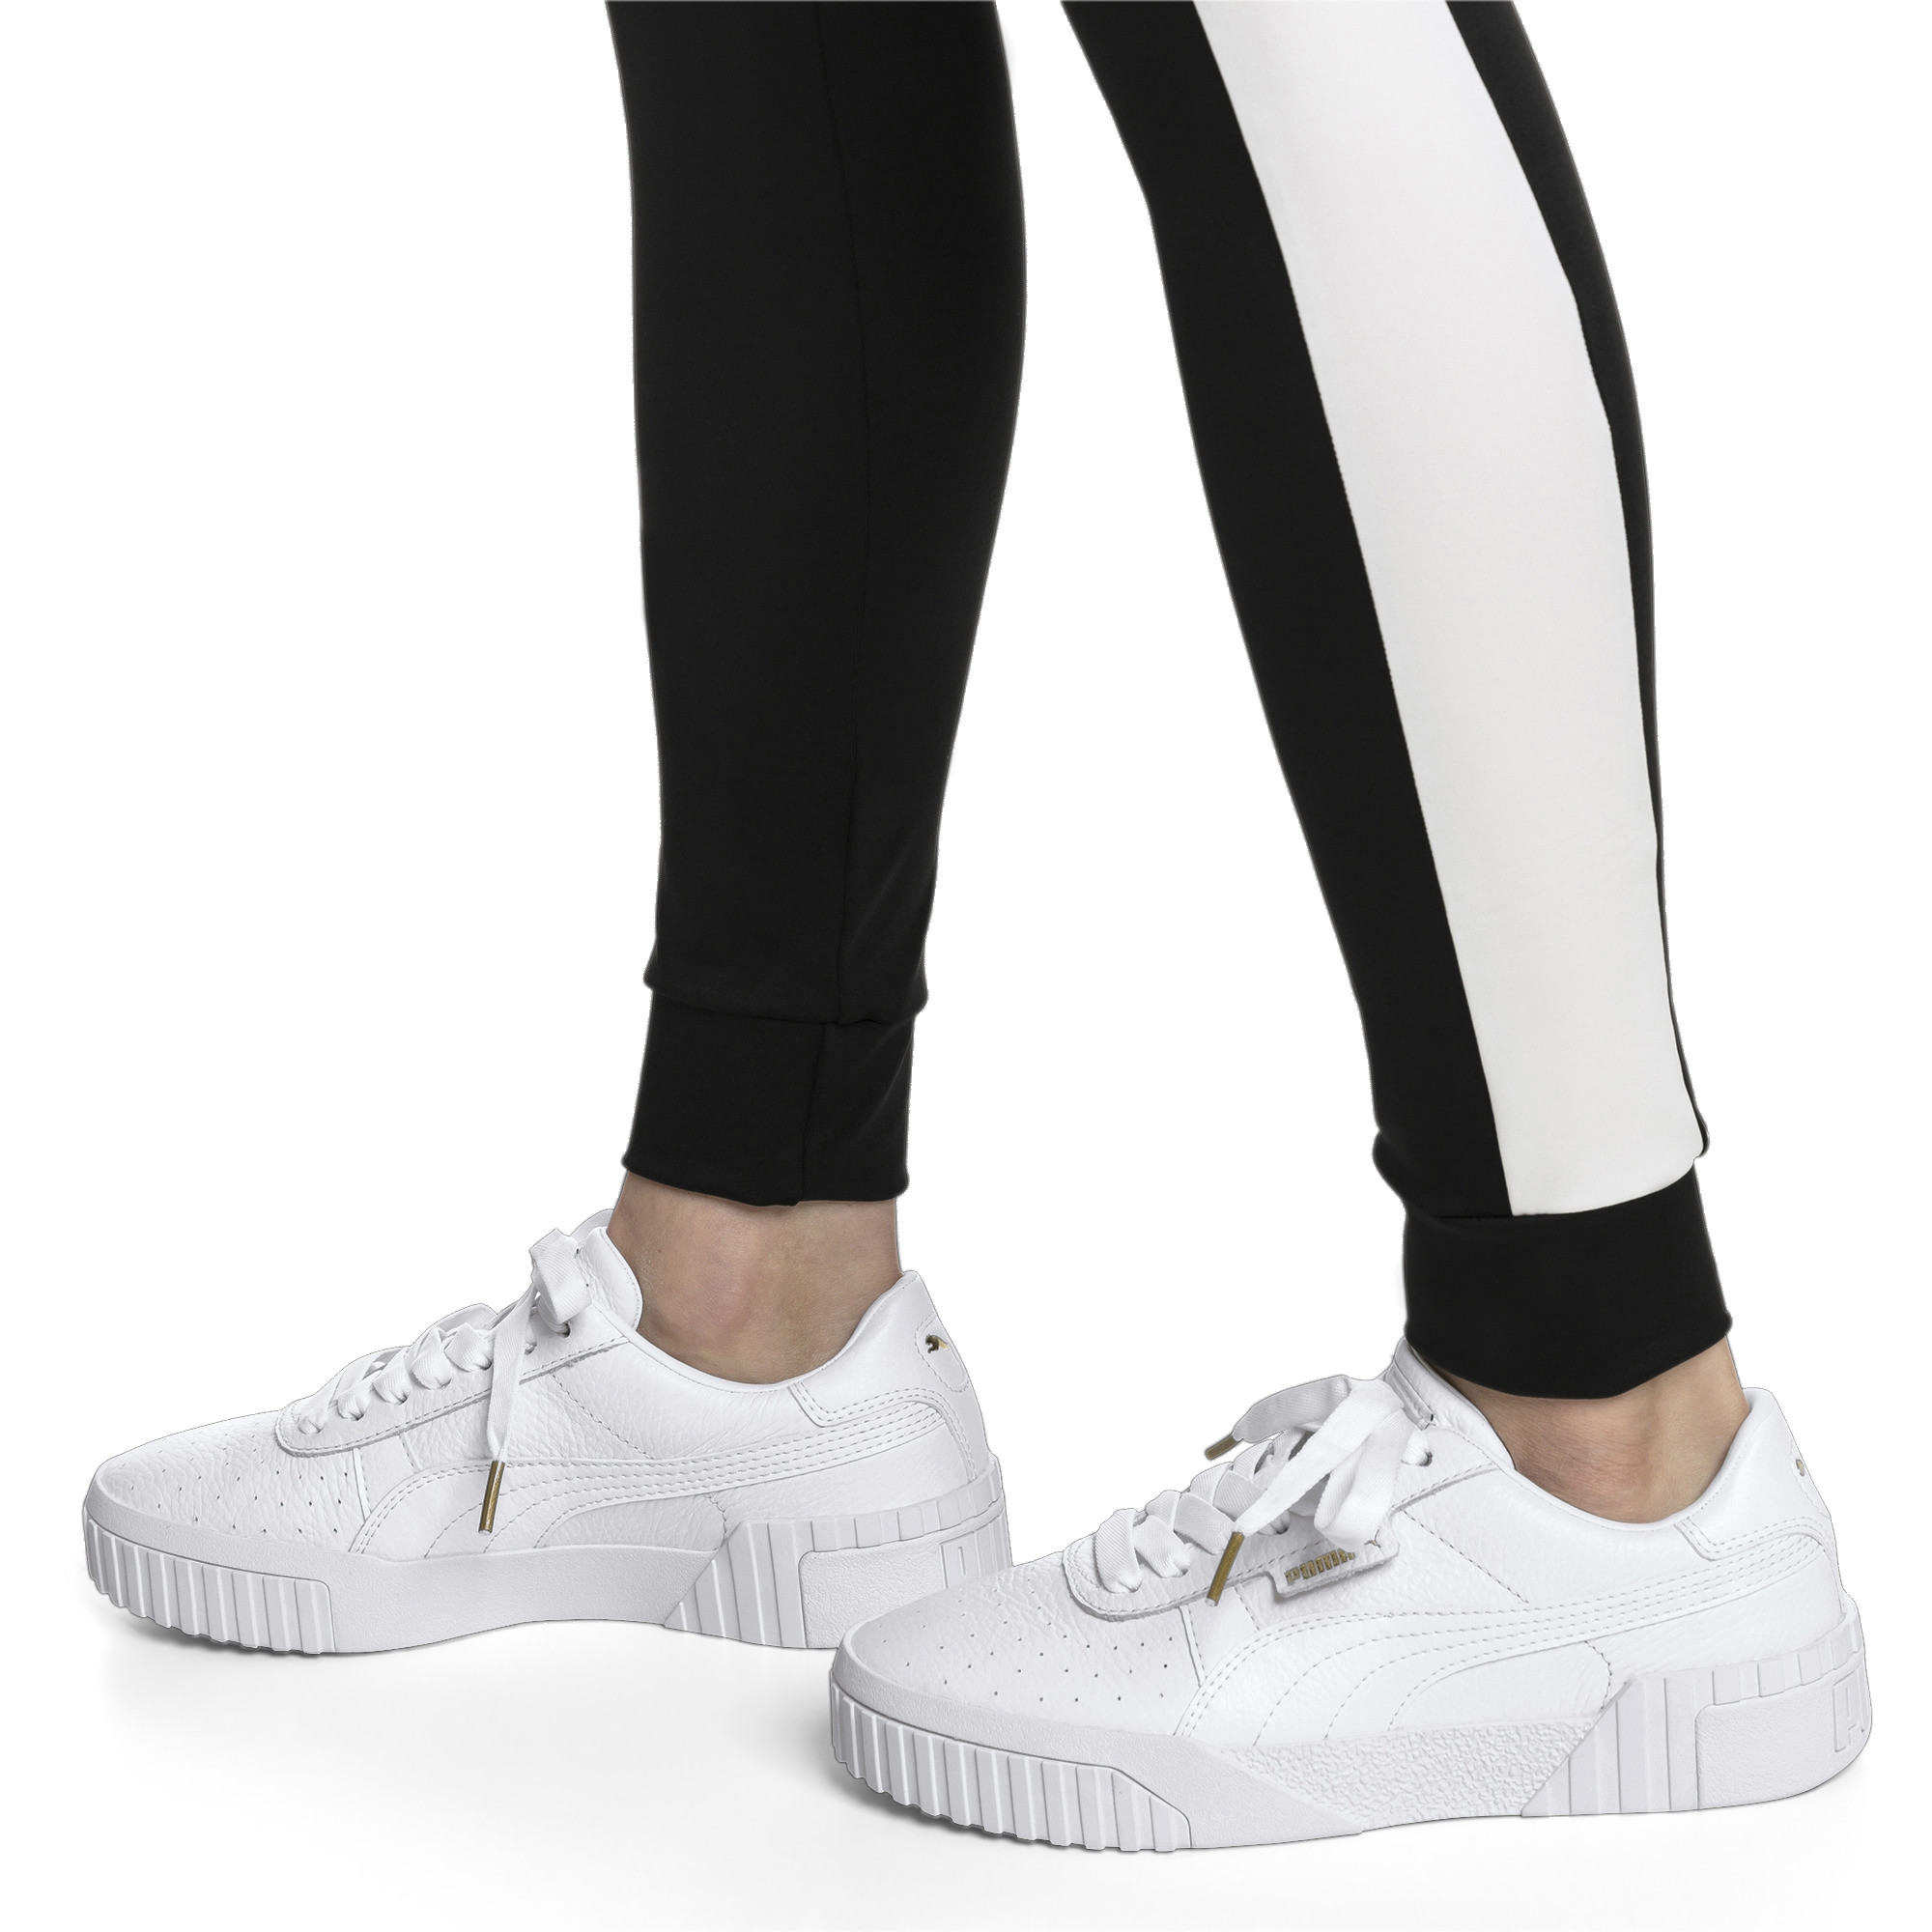 PUMA-Women-039-s-Cali-Sneakers thumbnail 10